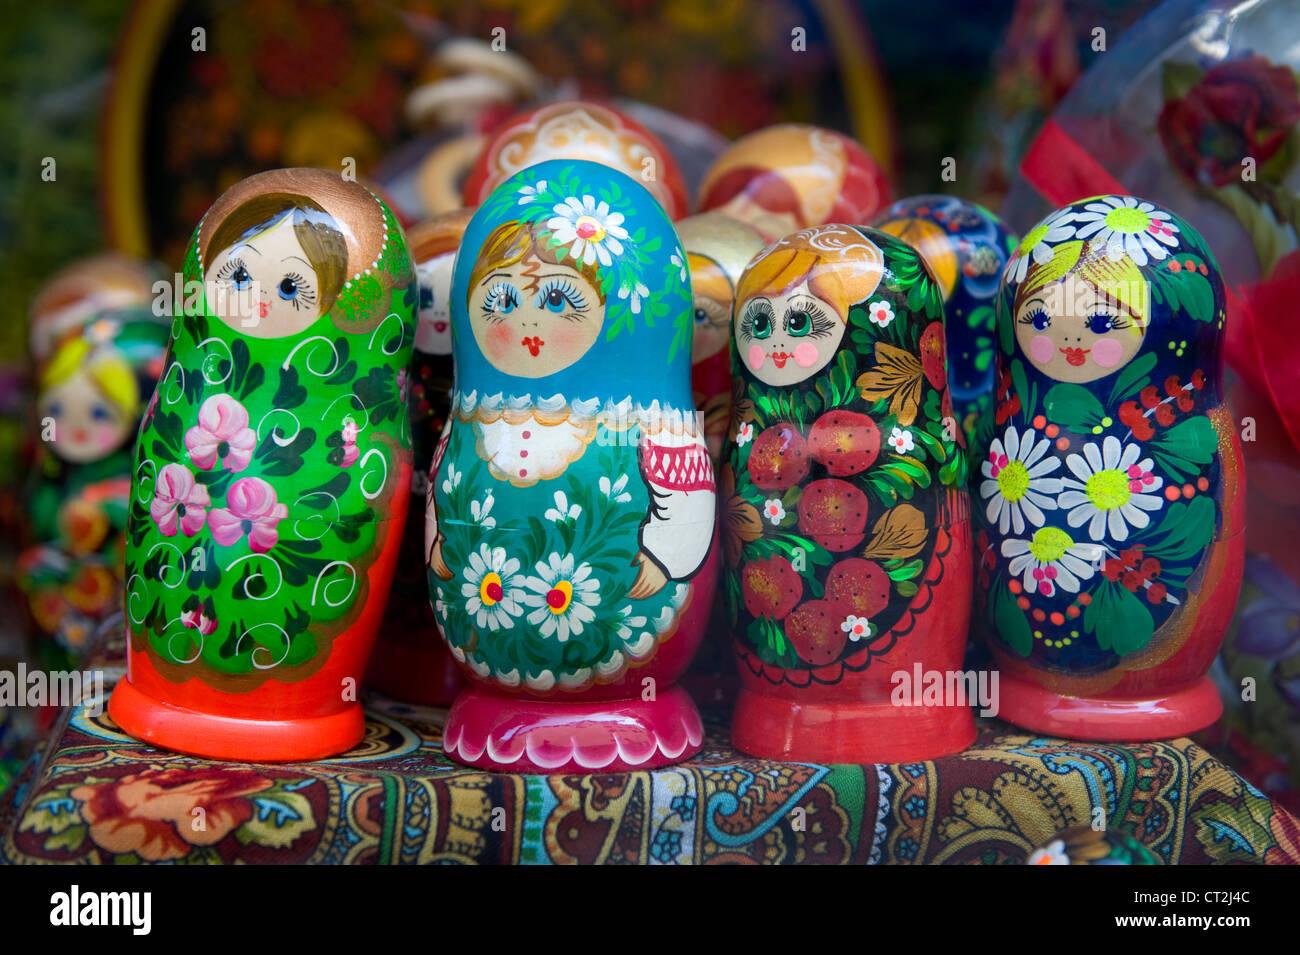 Cuatro babushka matrioshka o muñecas rusas. Foto de stock